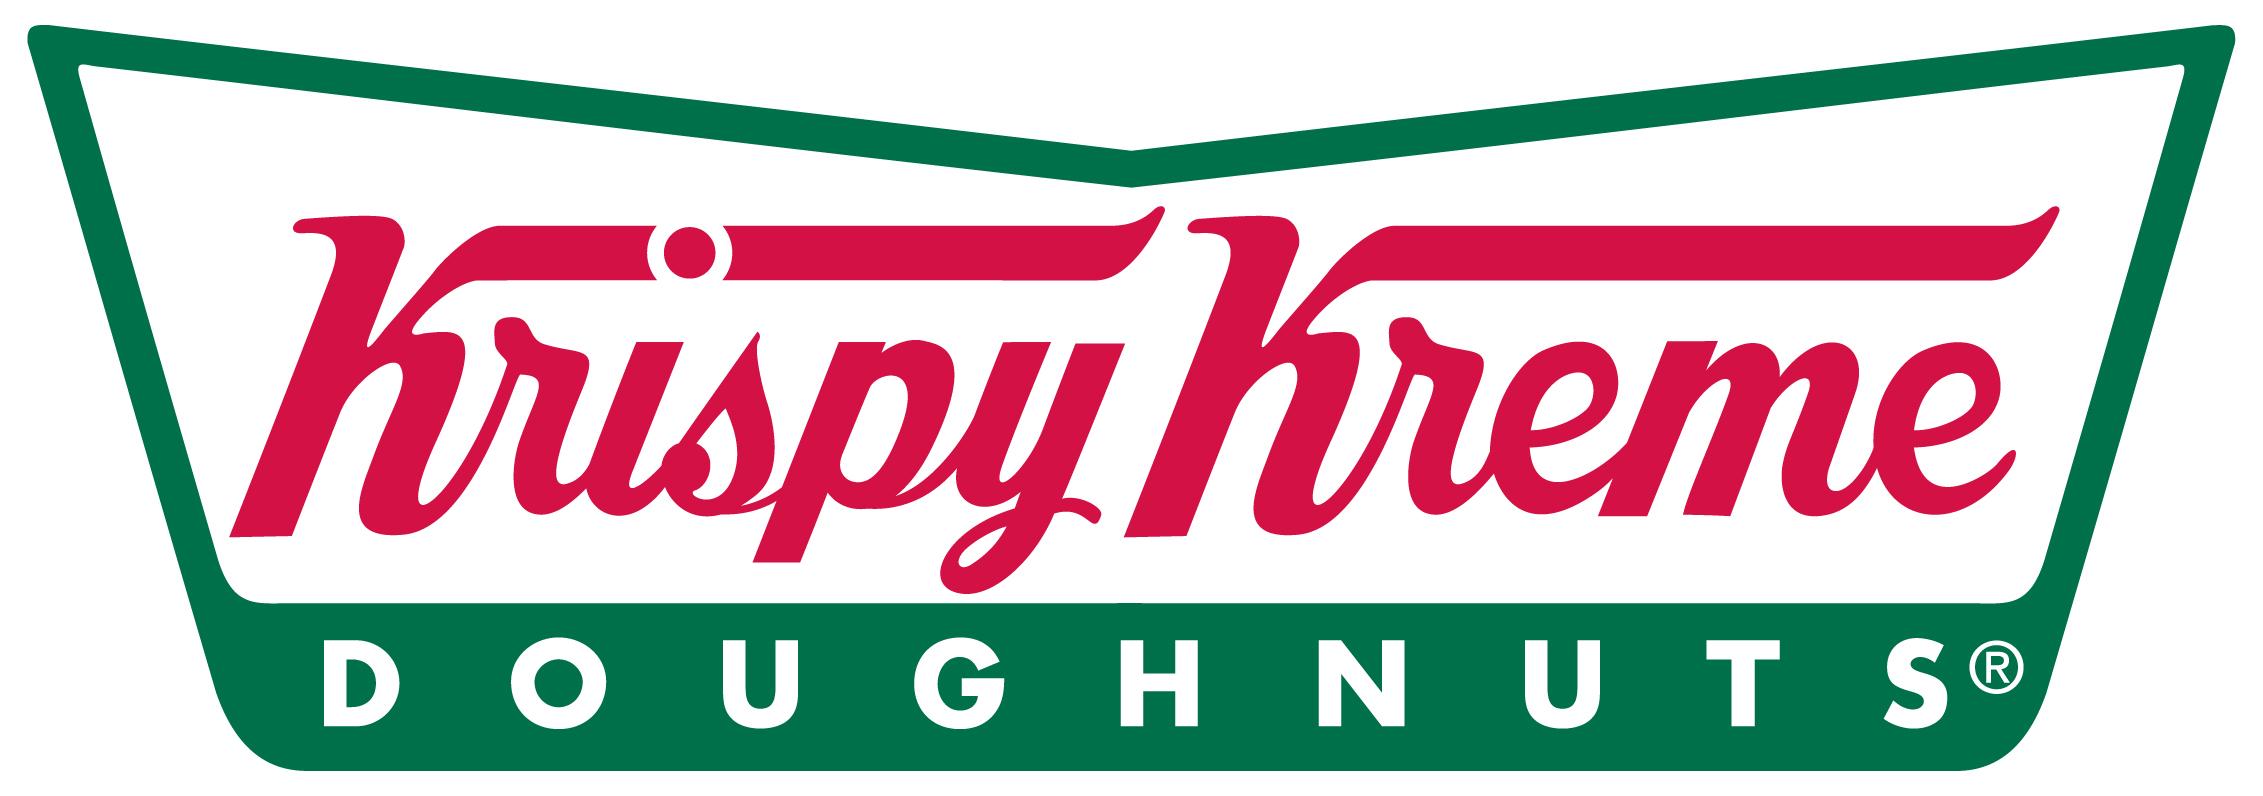 Krispy Kreme And The Salvation Army Partnership #StuffTheBus #CentralFlorida